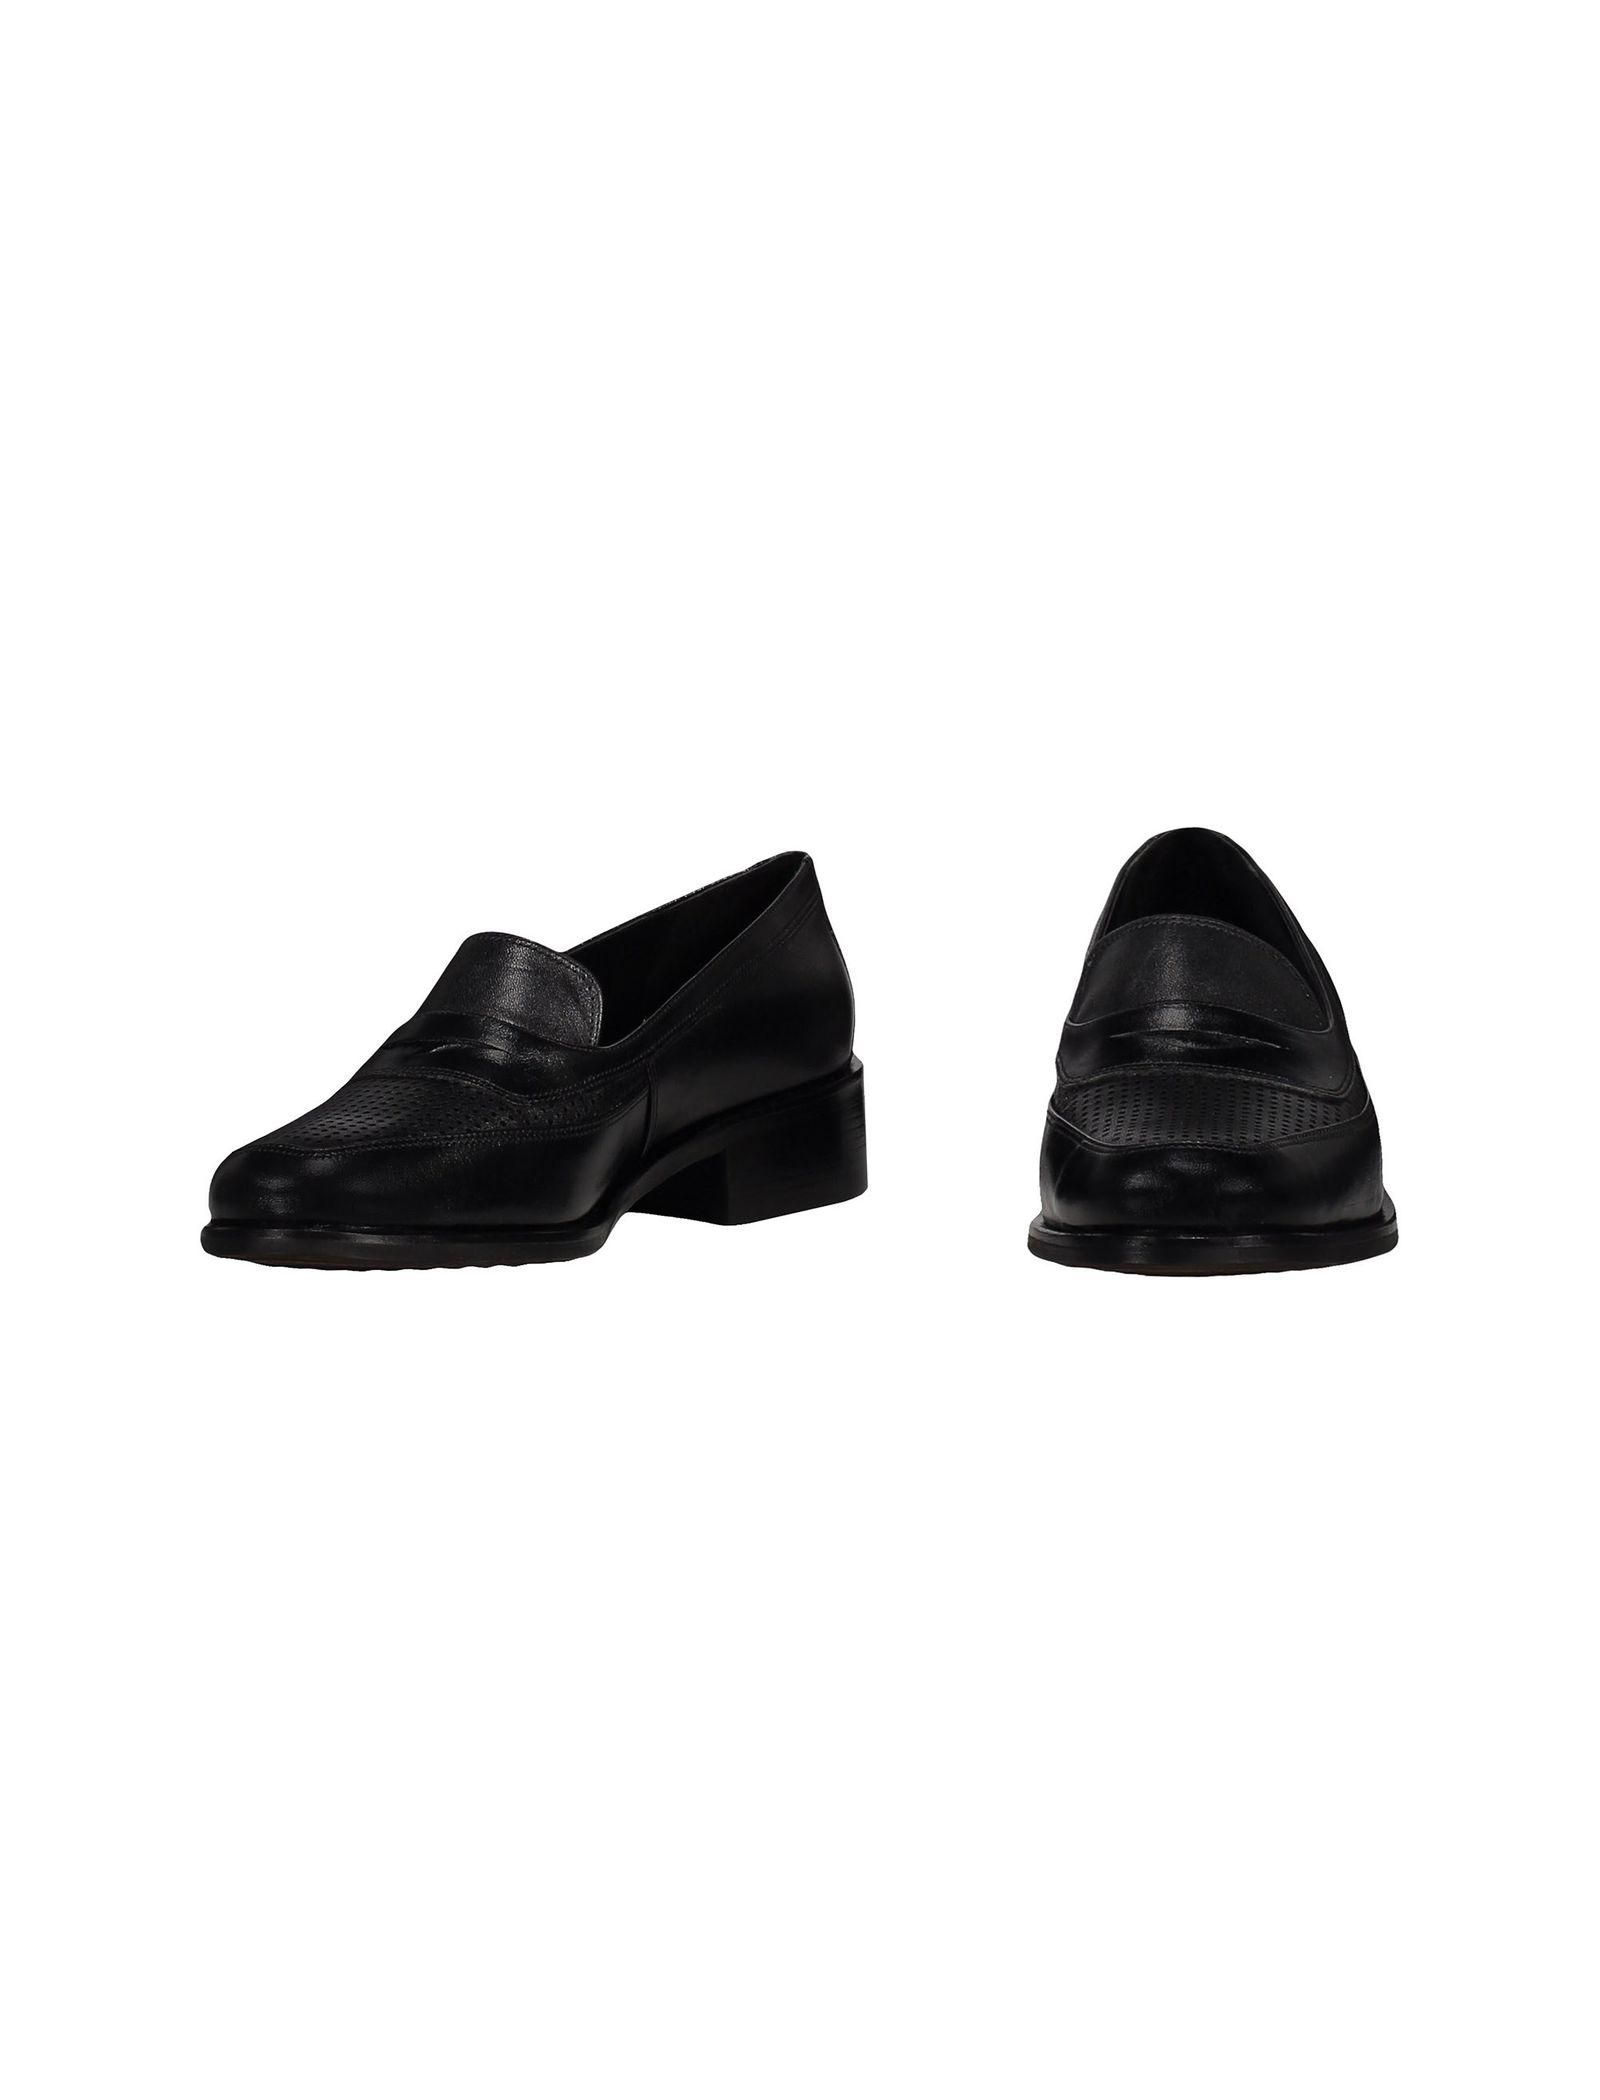 کفش چرم تخت زنانه - شهر چرم - مشکي - 4